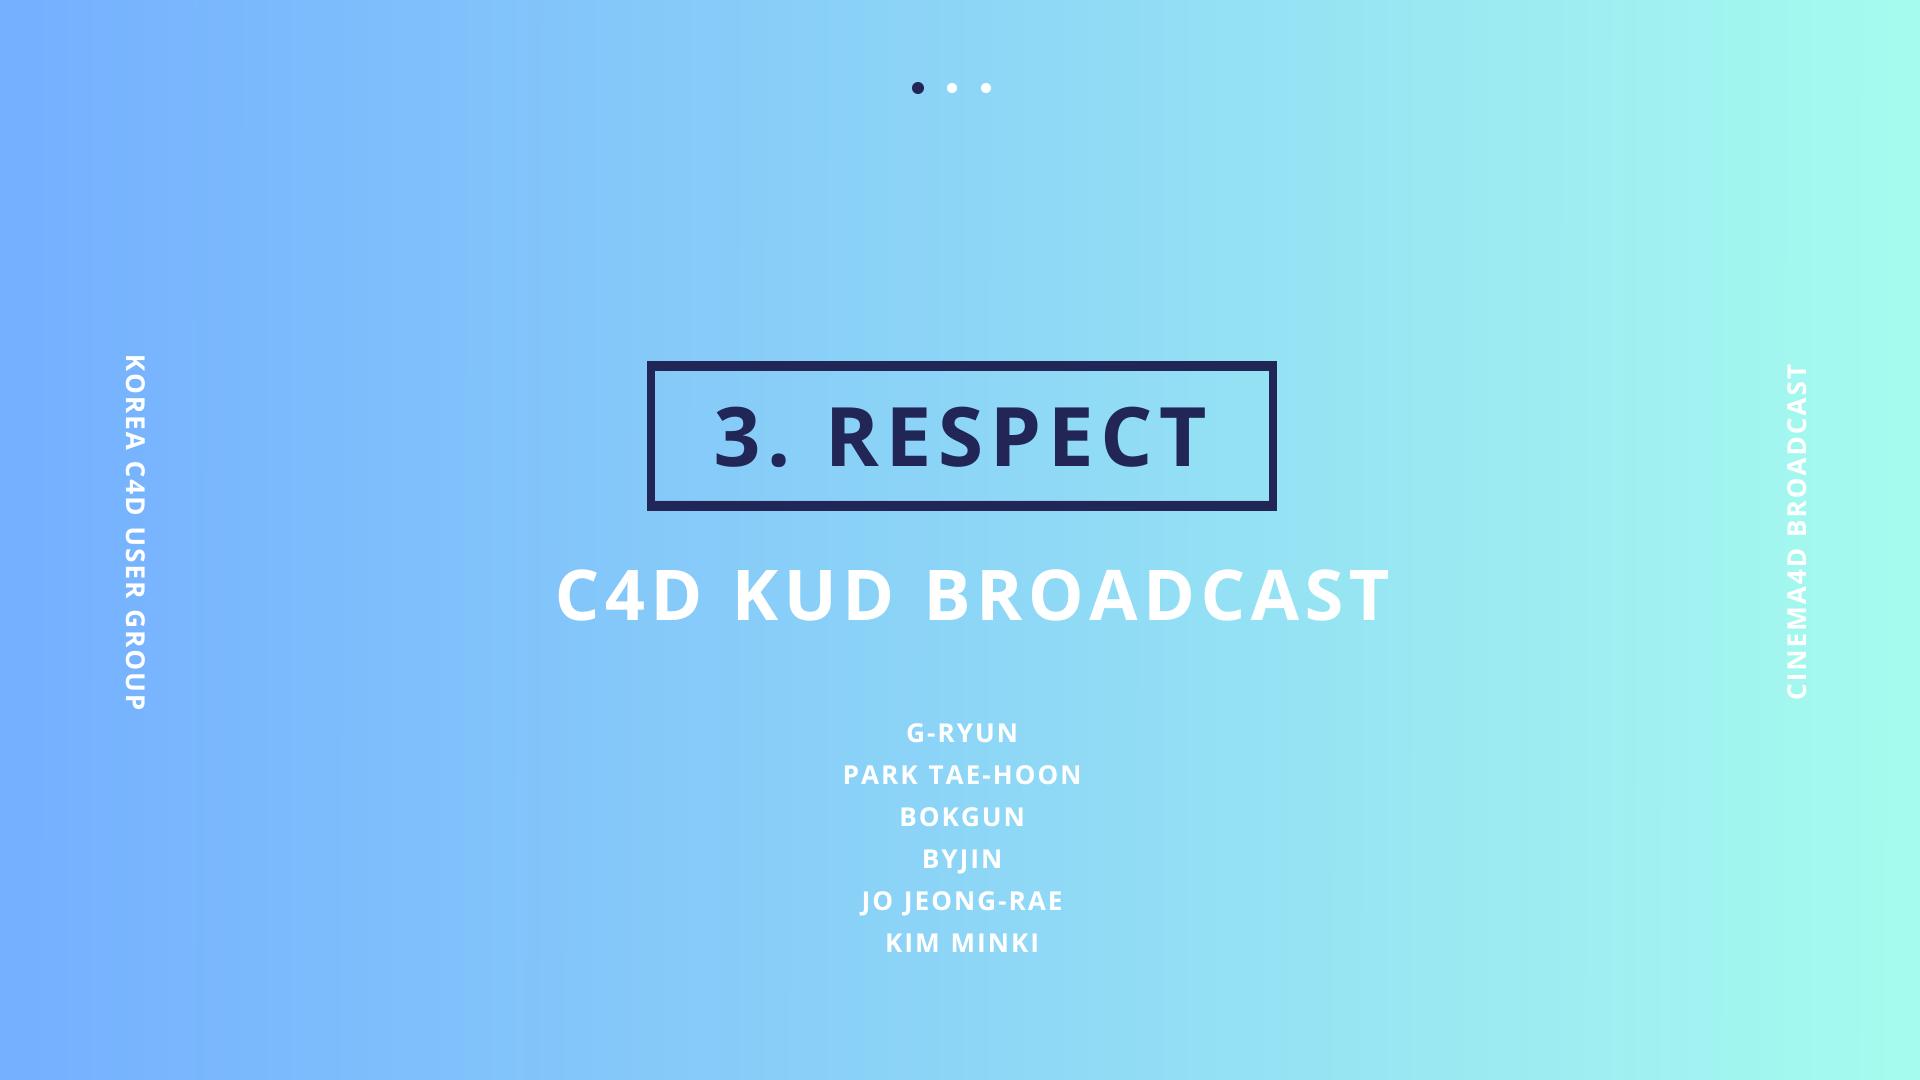 C4D_KUG_BroadCast_3m_Respect_C4D_KUG_BroadCast_2m_2017-11-23_18.35.50.png